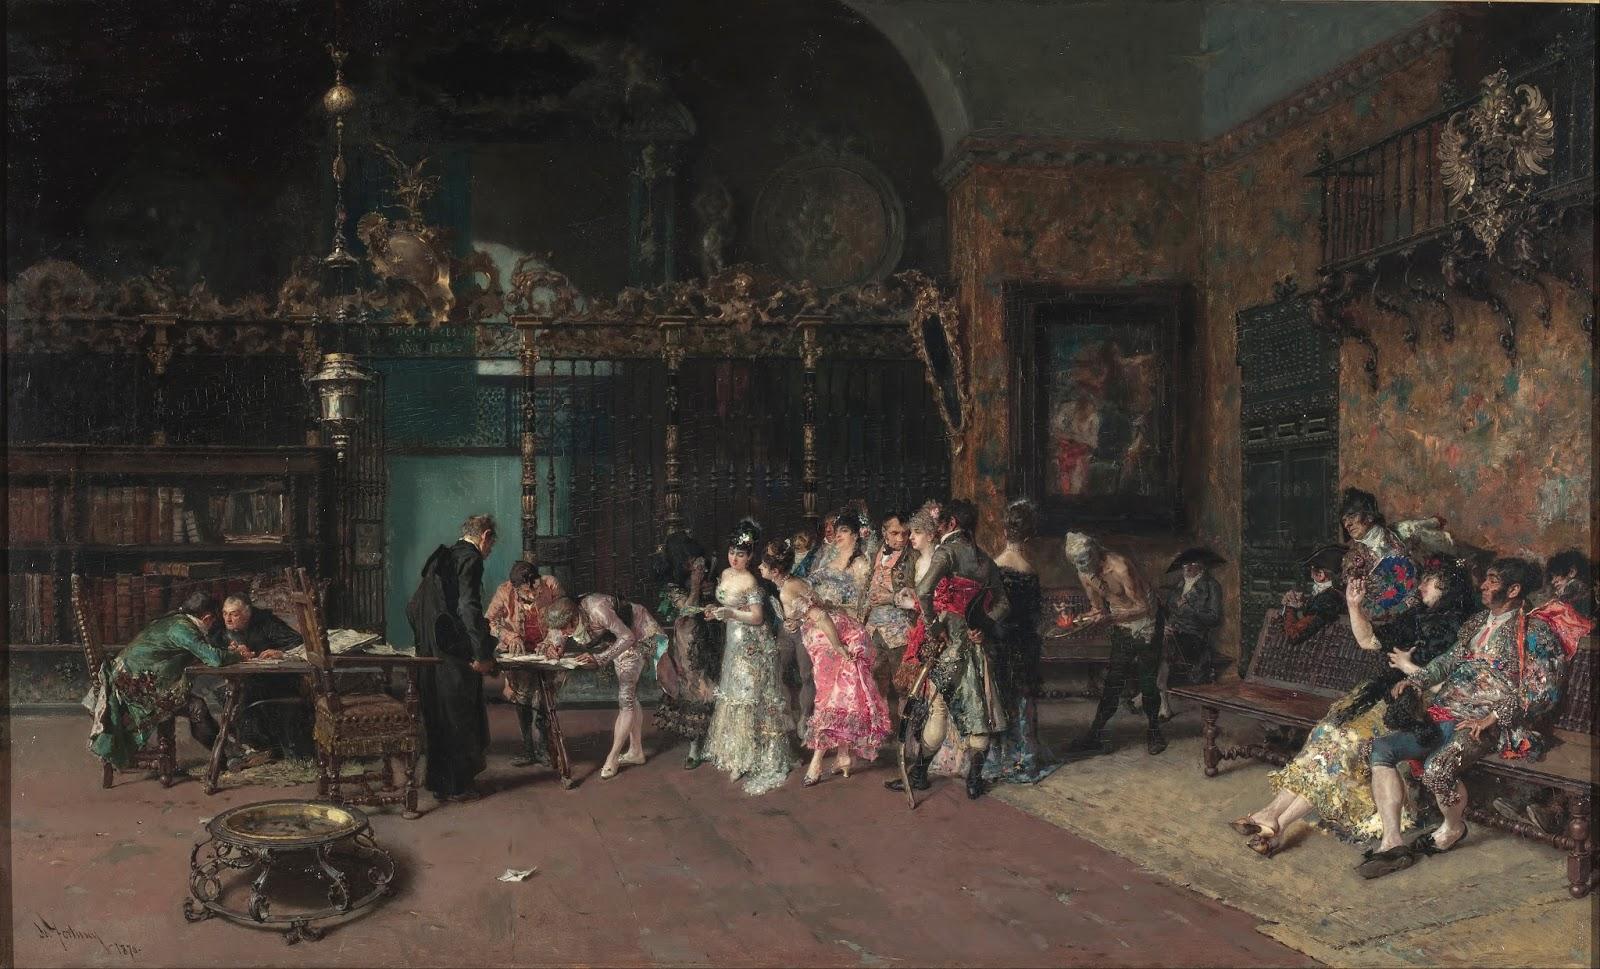 MARIANO FORTUNY Y MARSAL - O casamento espanhol - Óleo sobre tela - 60 x 93,5 - 1870 - Museu Nacional de Arte da Catalunha.jpg